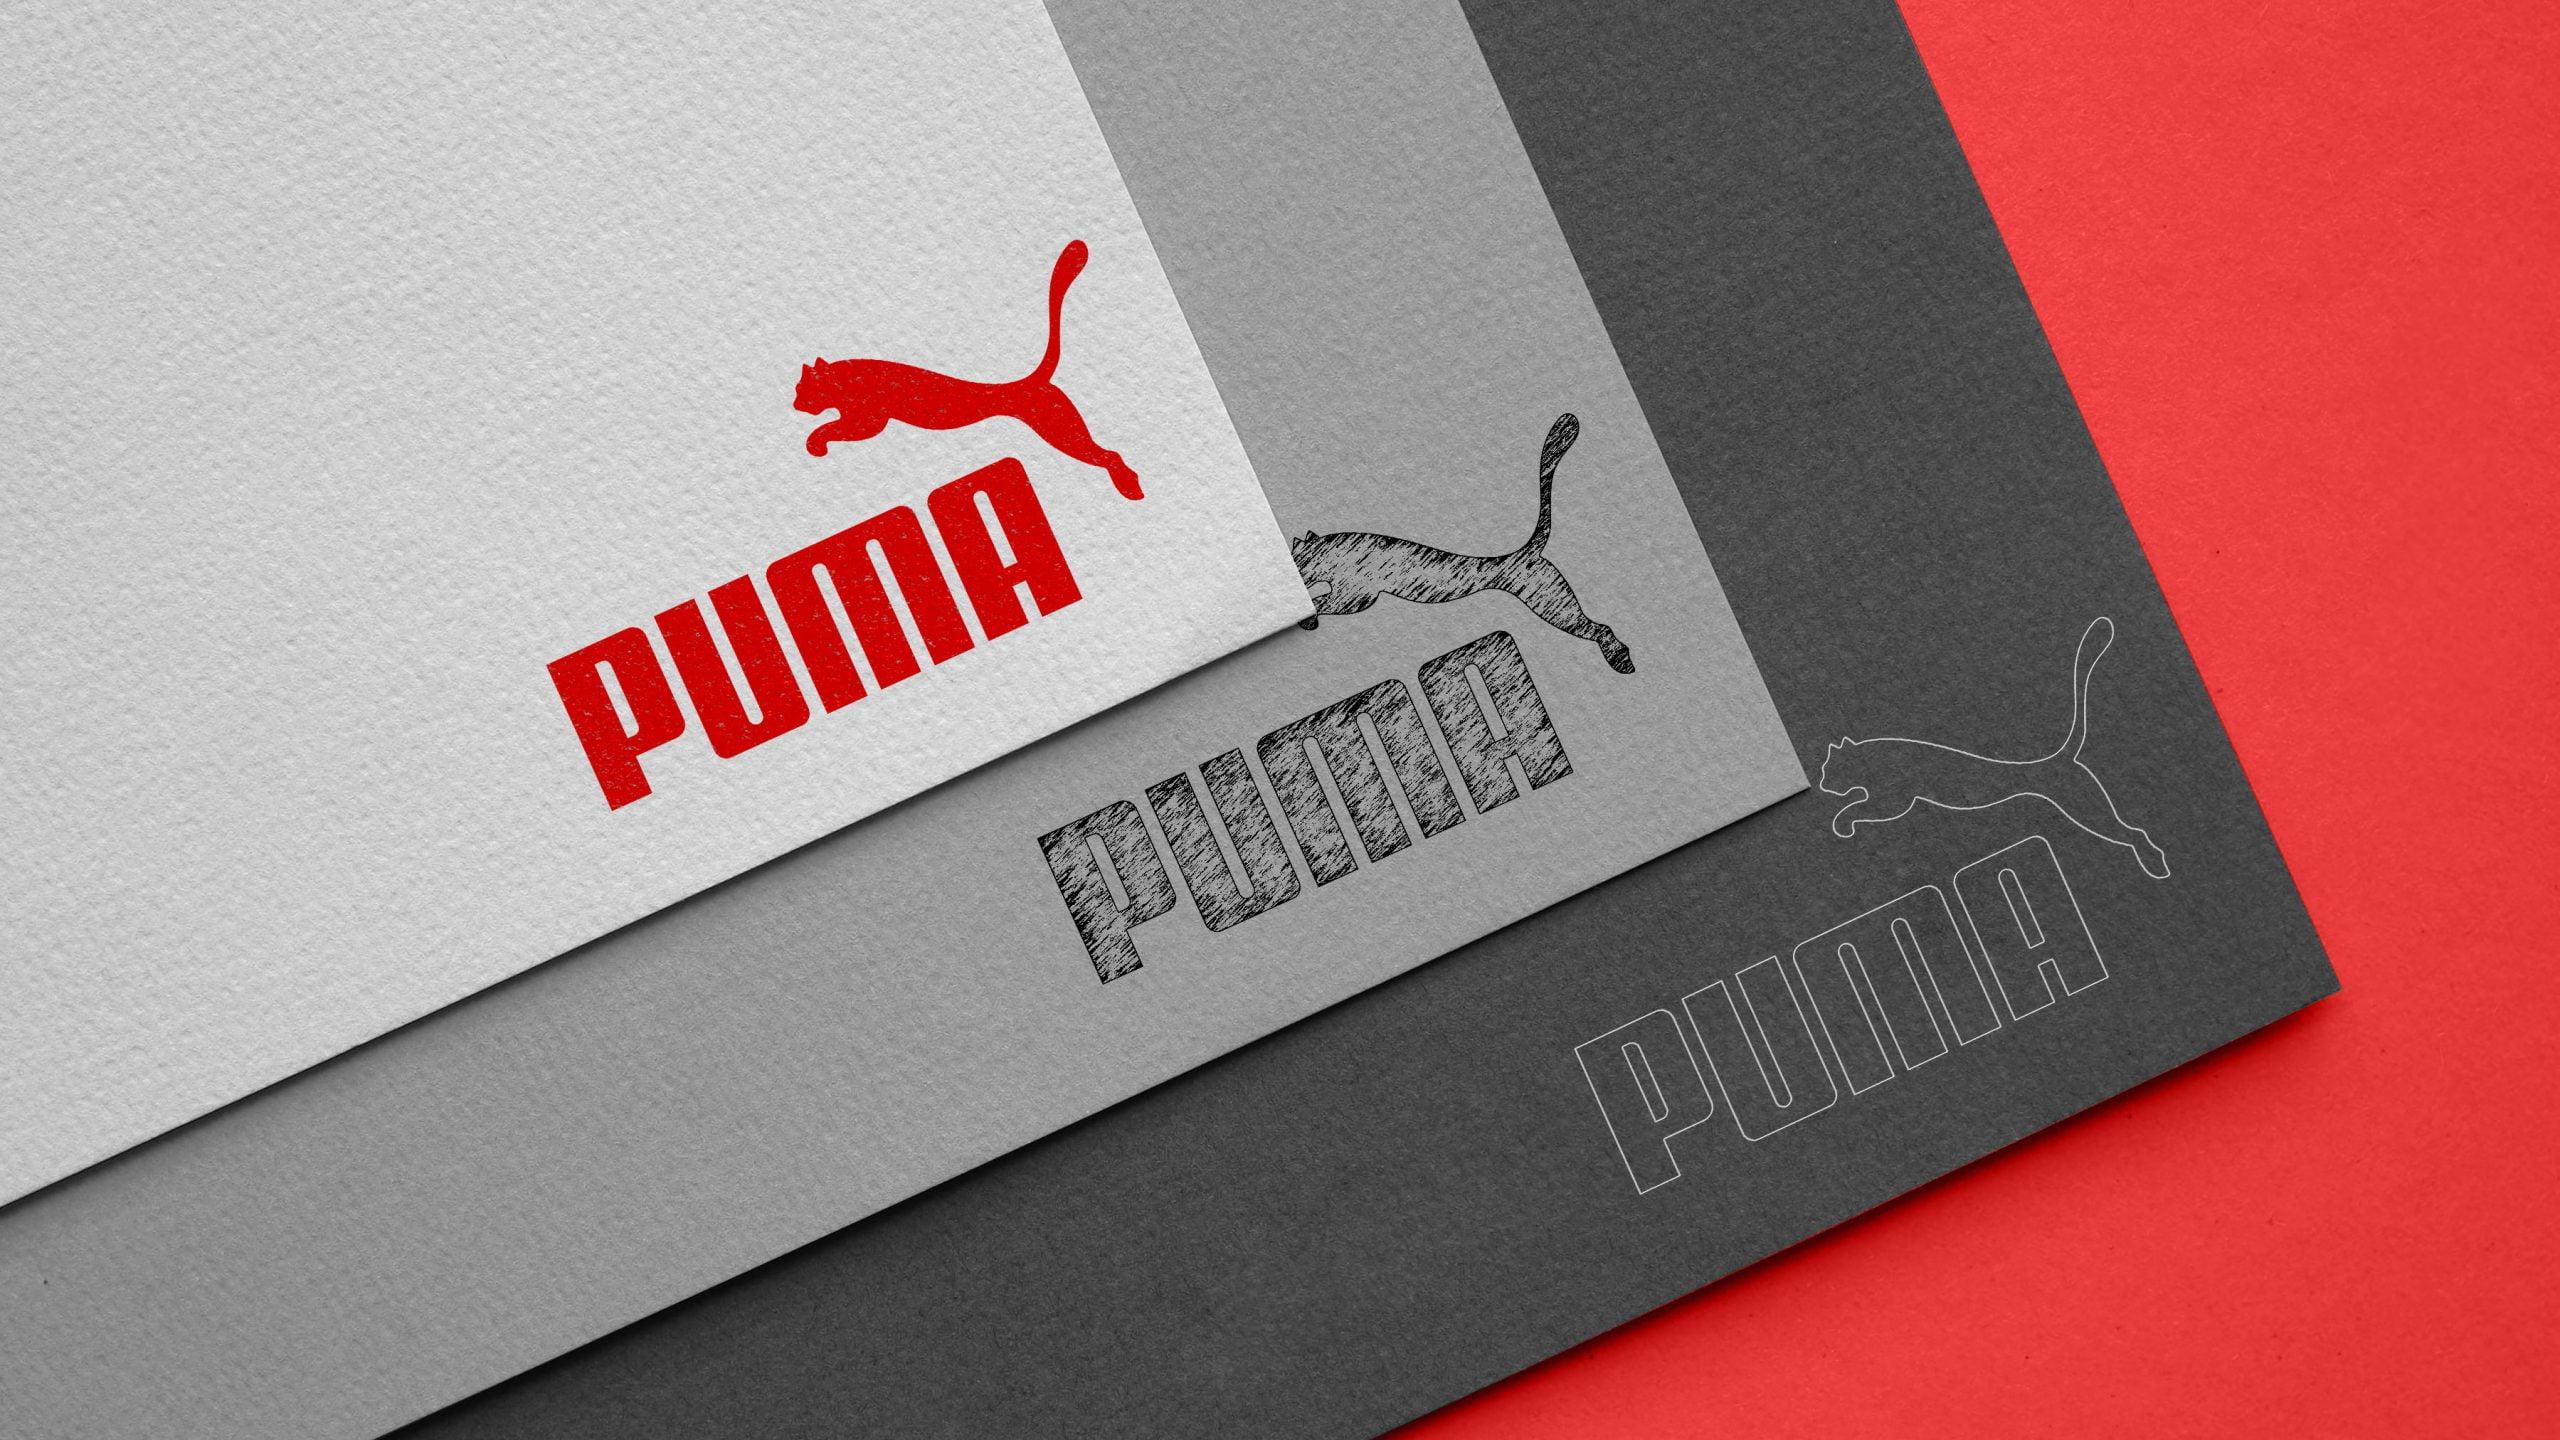 Carboard Logo Mockup Puma